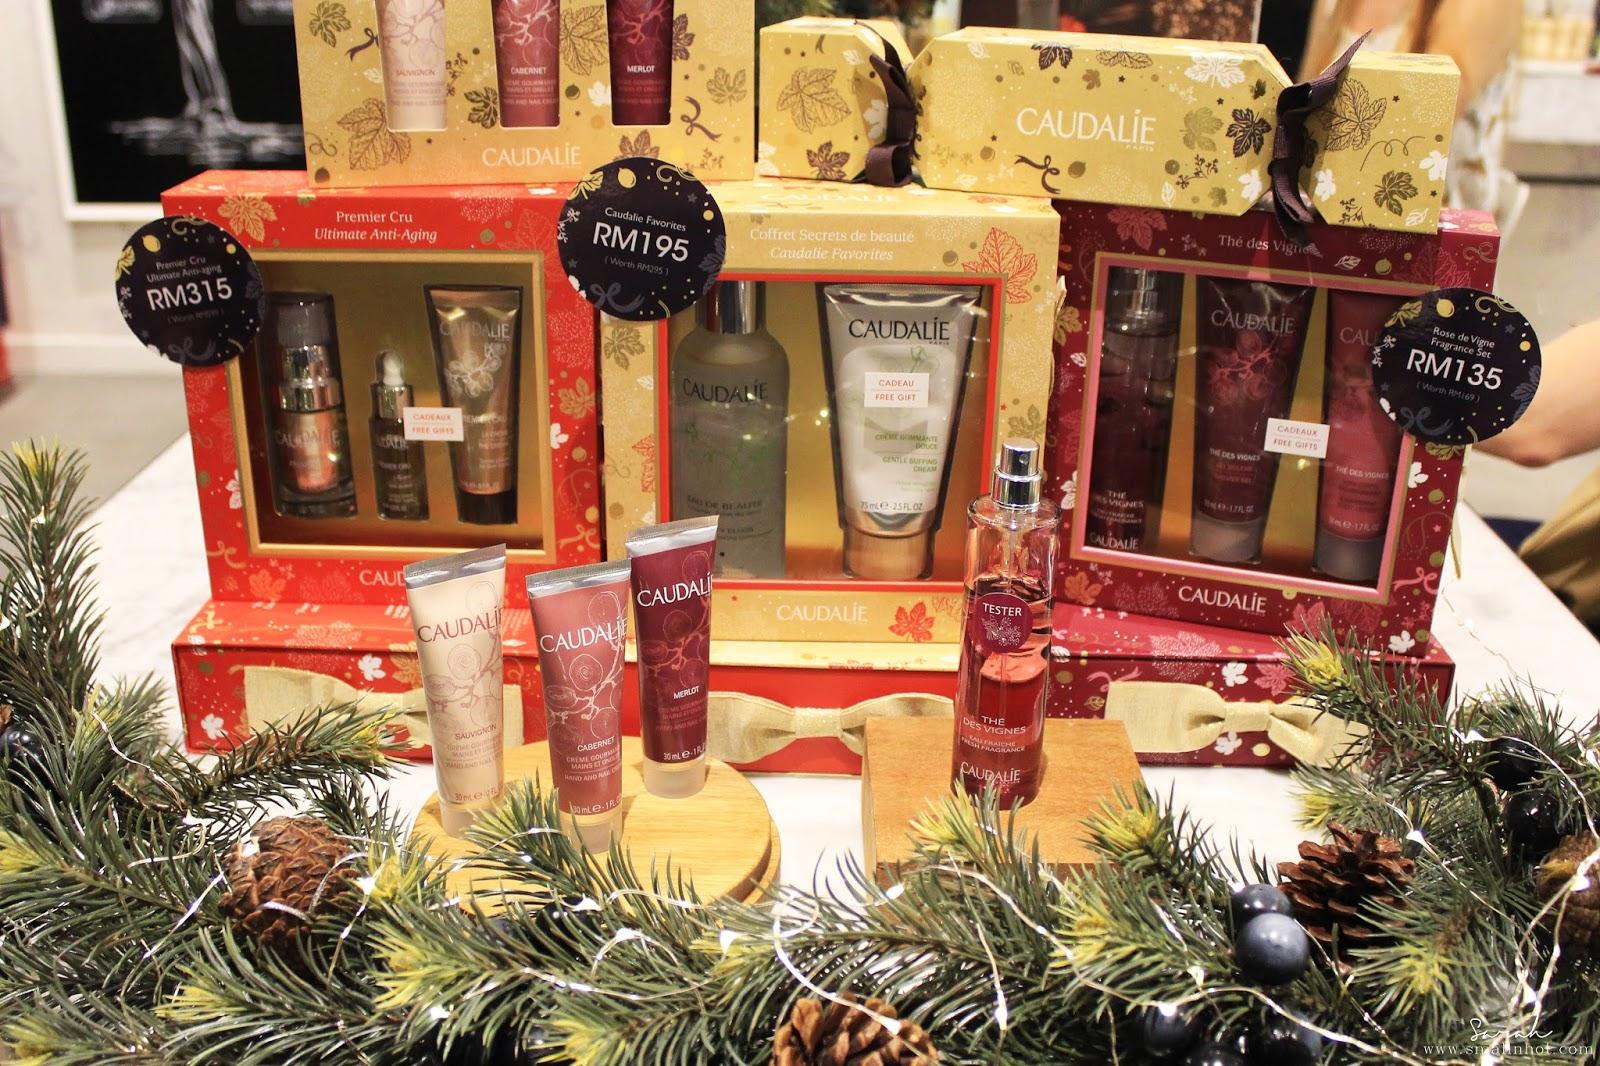 Caudalie christmas collection 2016; caudalie gift sets; caudalie holiday skincare collection; caudalie holiday